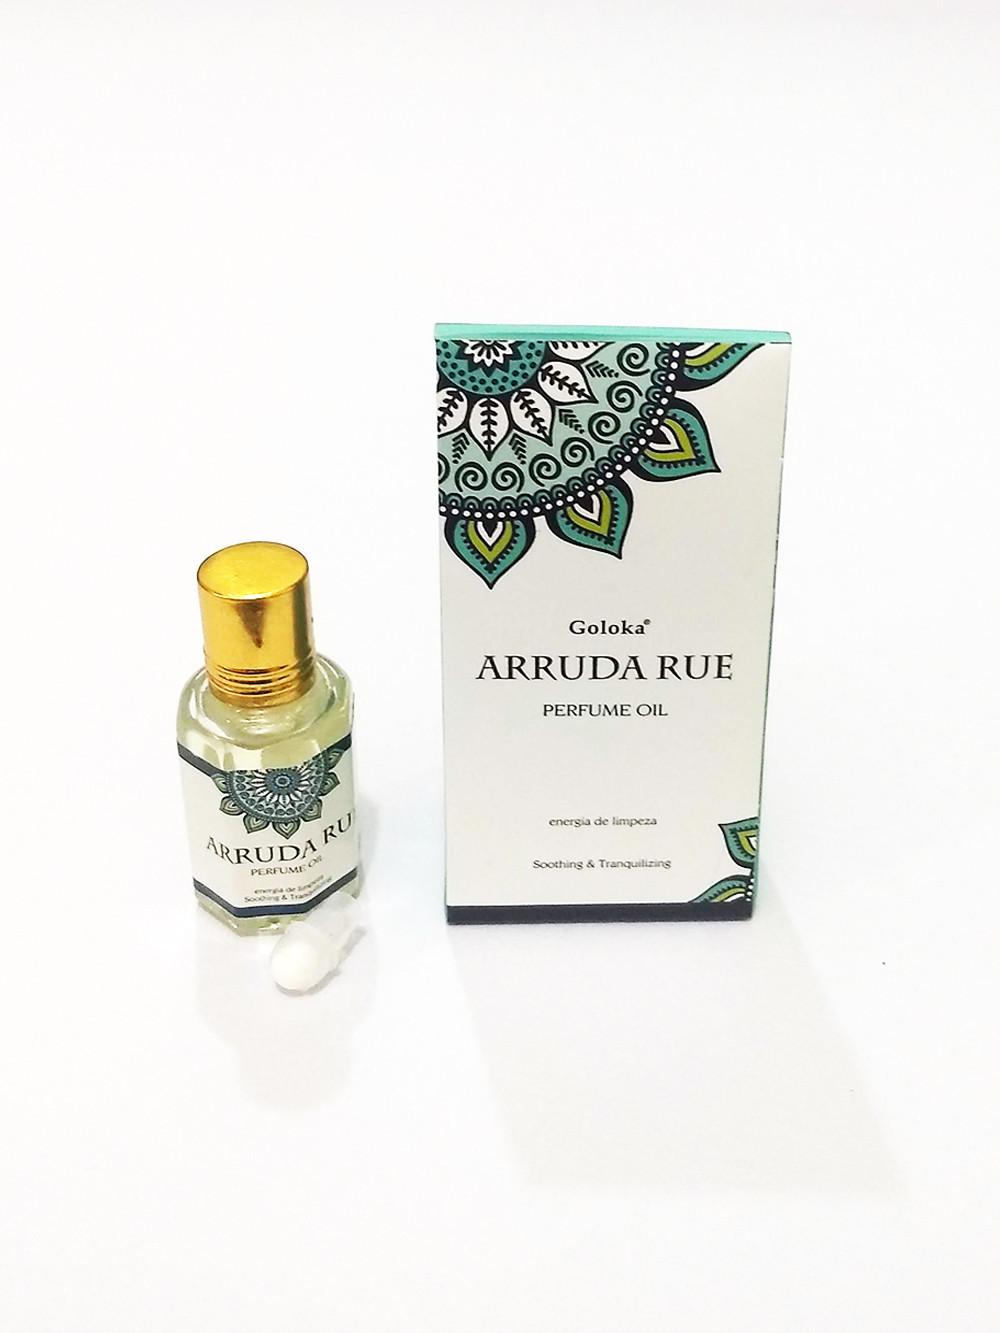 3212-11 - Óleo Perfumado Goloka Arruda Rue 10ml